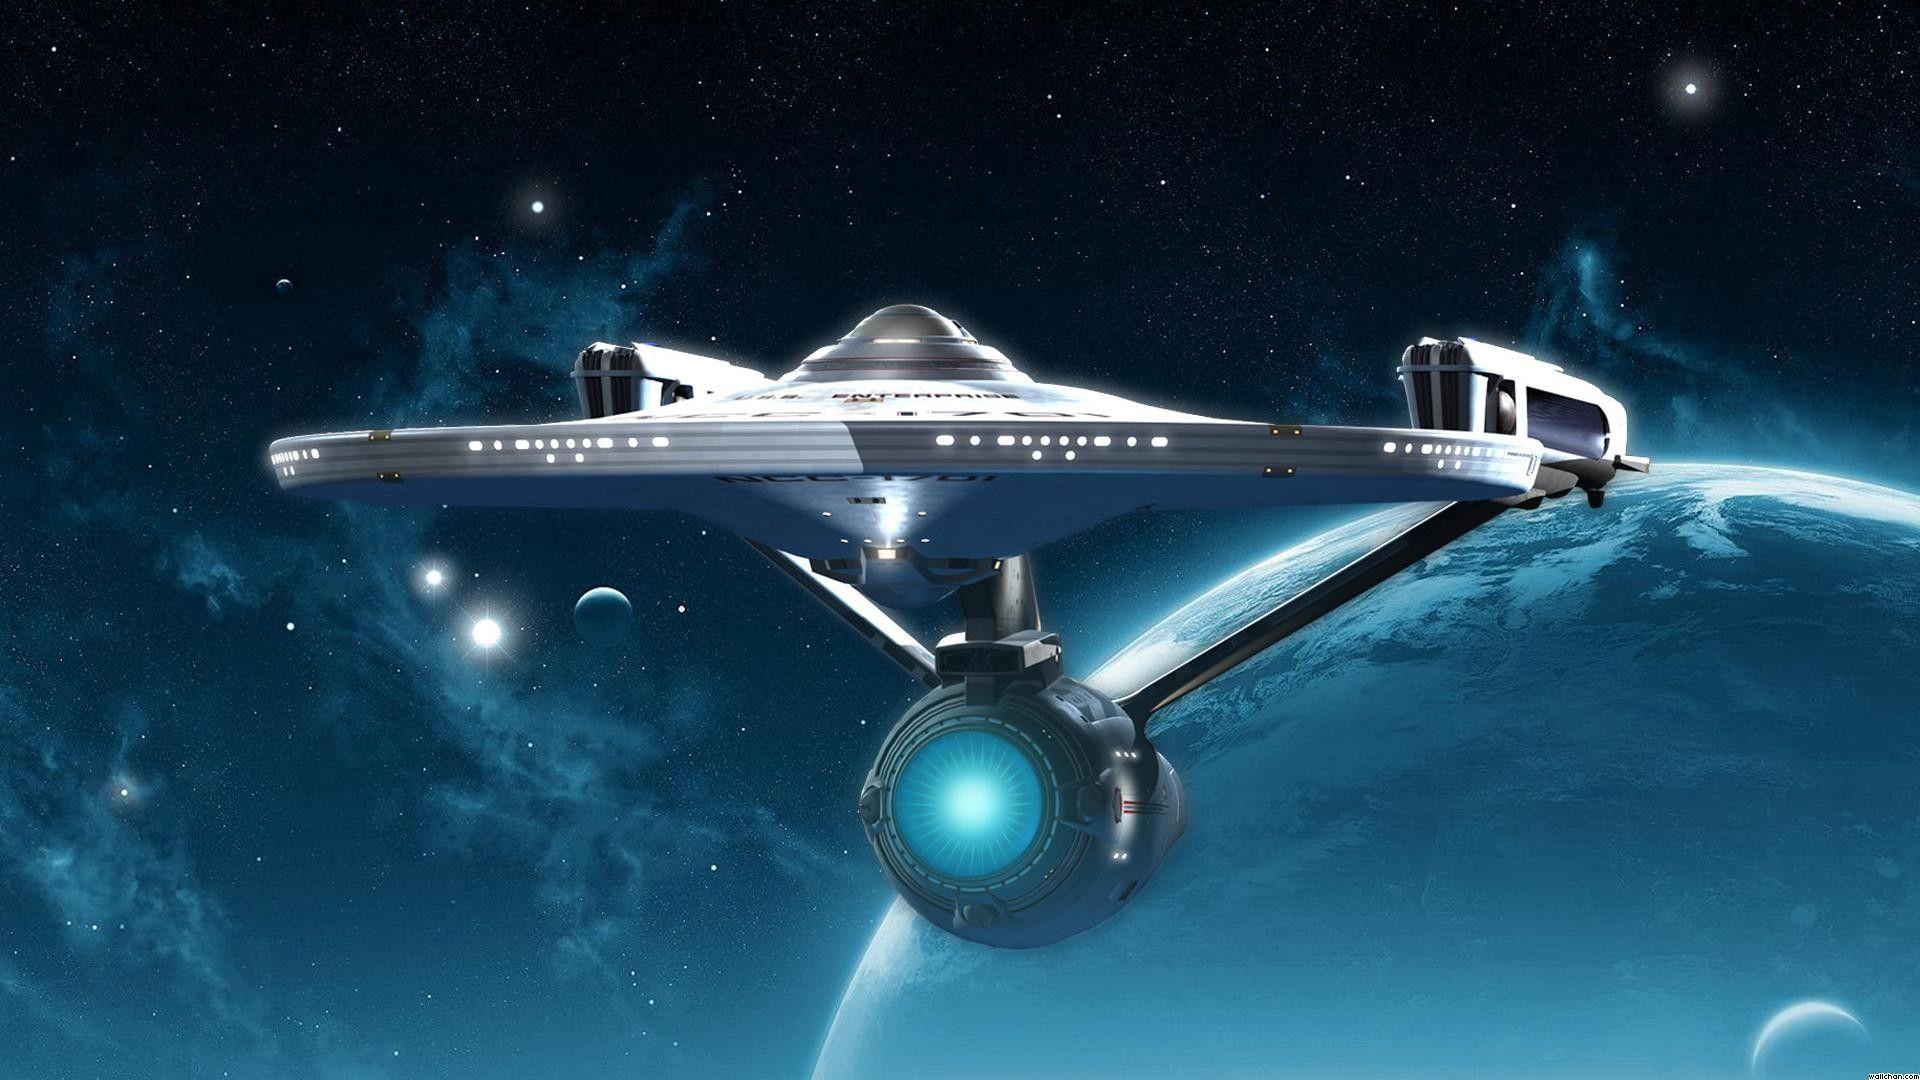 1920x1080 Star Trek Enterprise Wallpaper Viewing Gallery